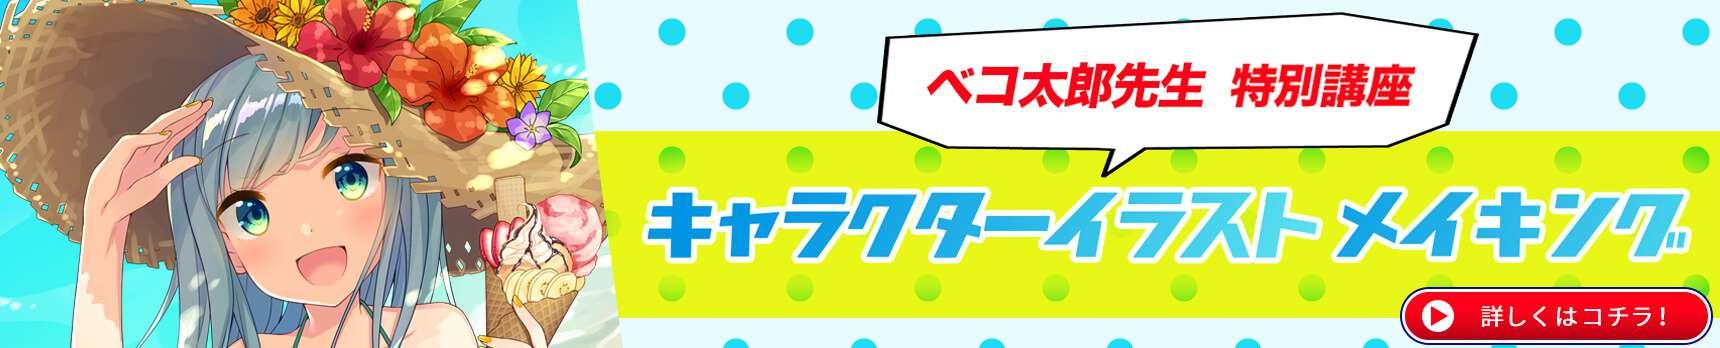 Bekotaro rec banner pc